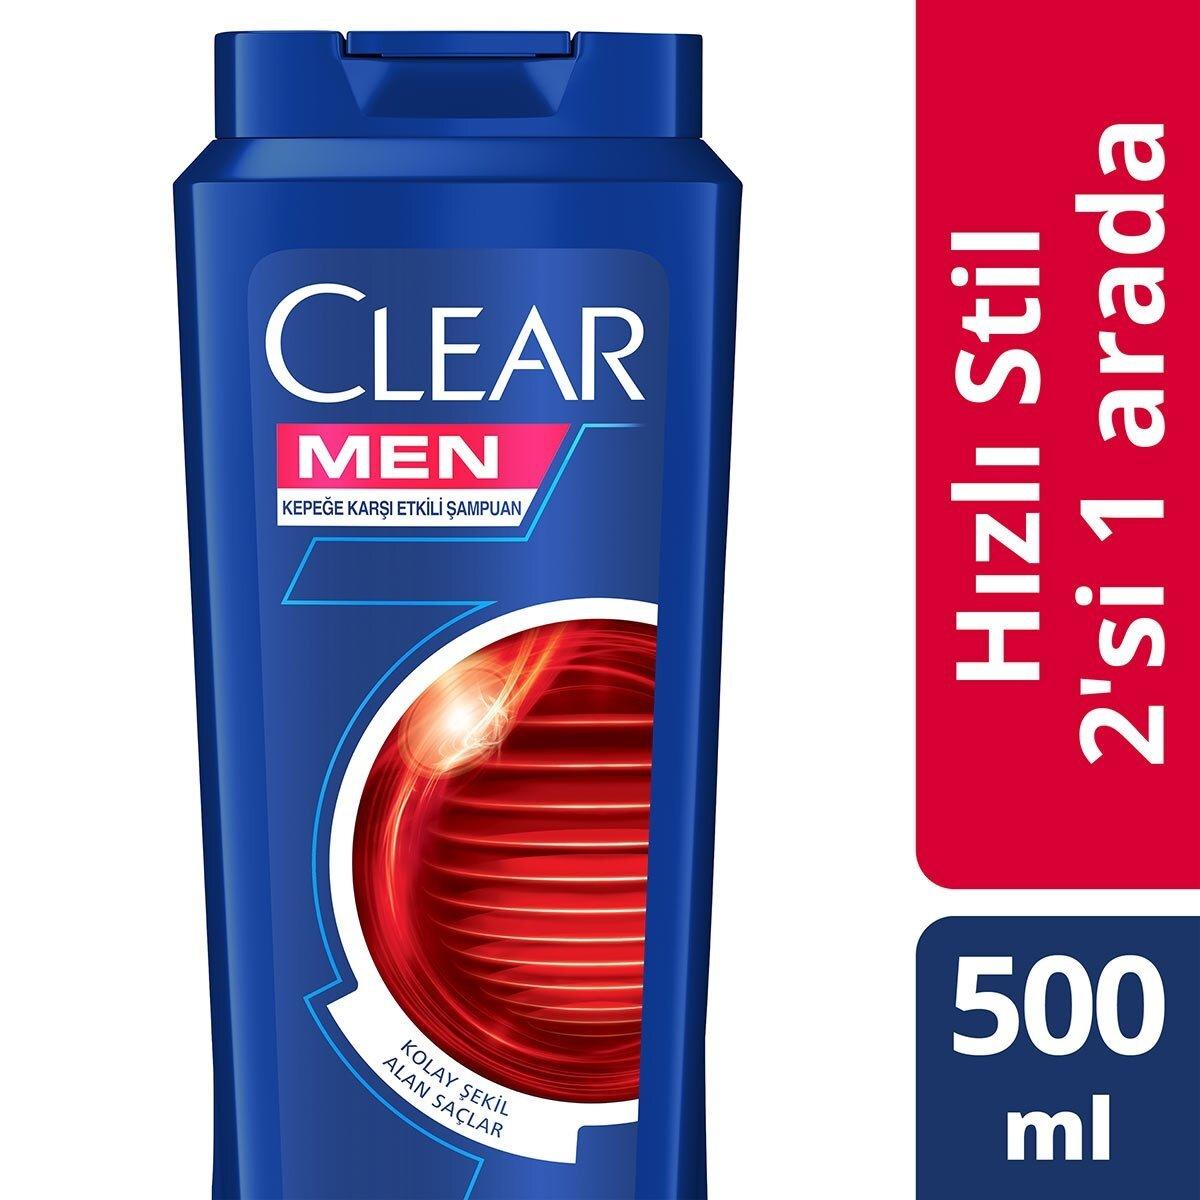 Hizli Stil 2si1 Arada Erkek Şampuan 500ml